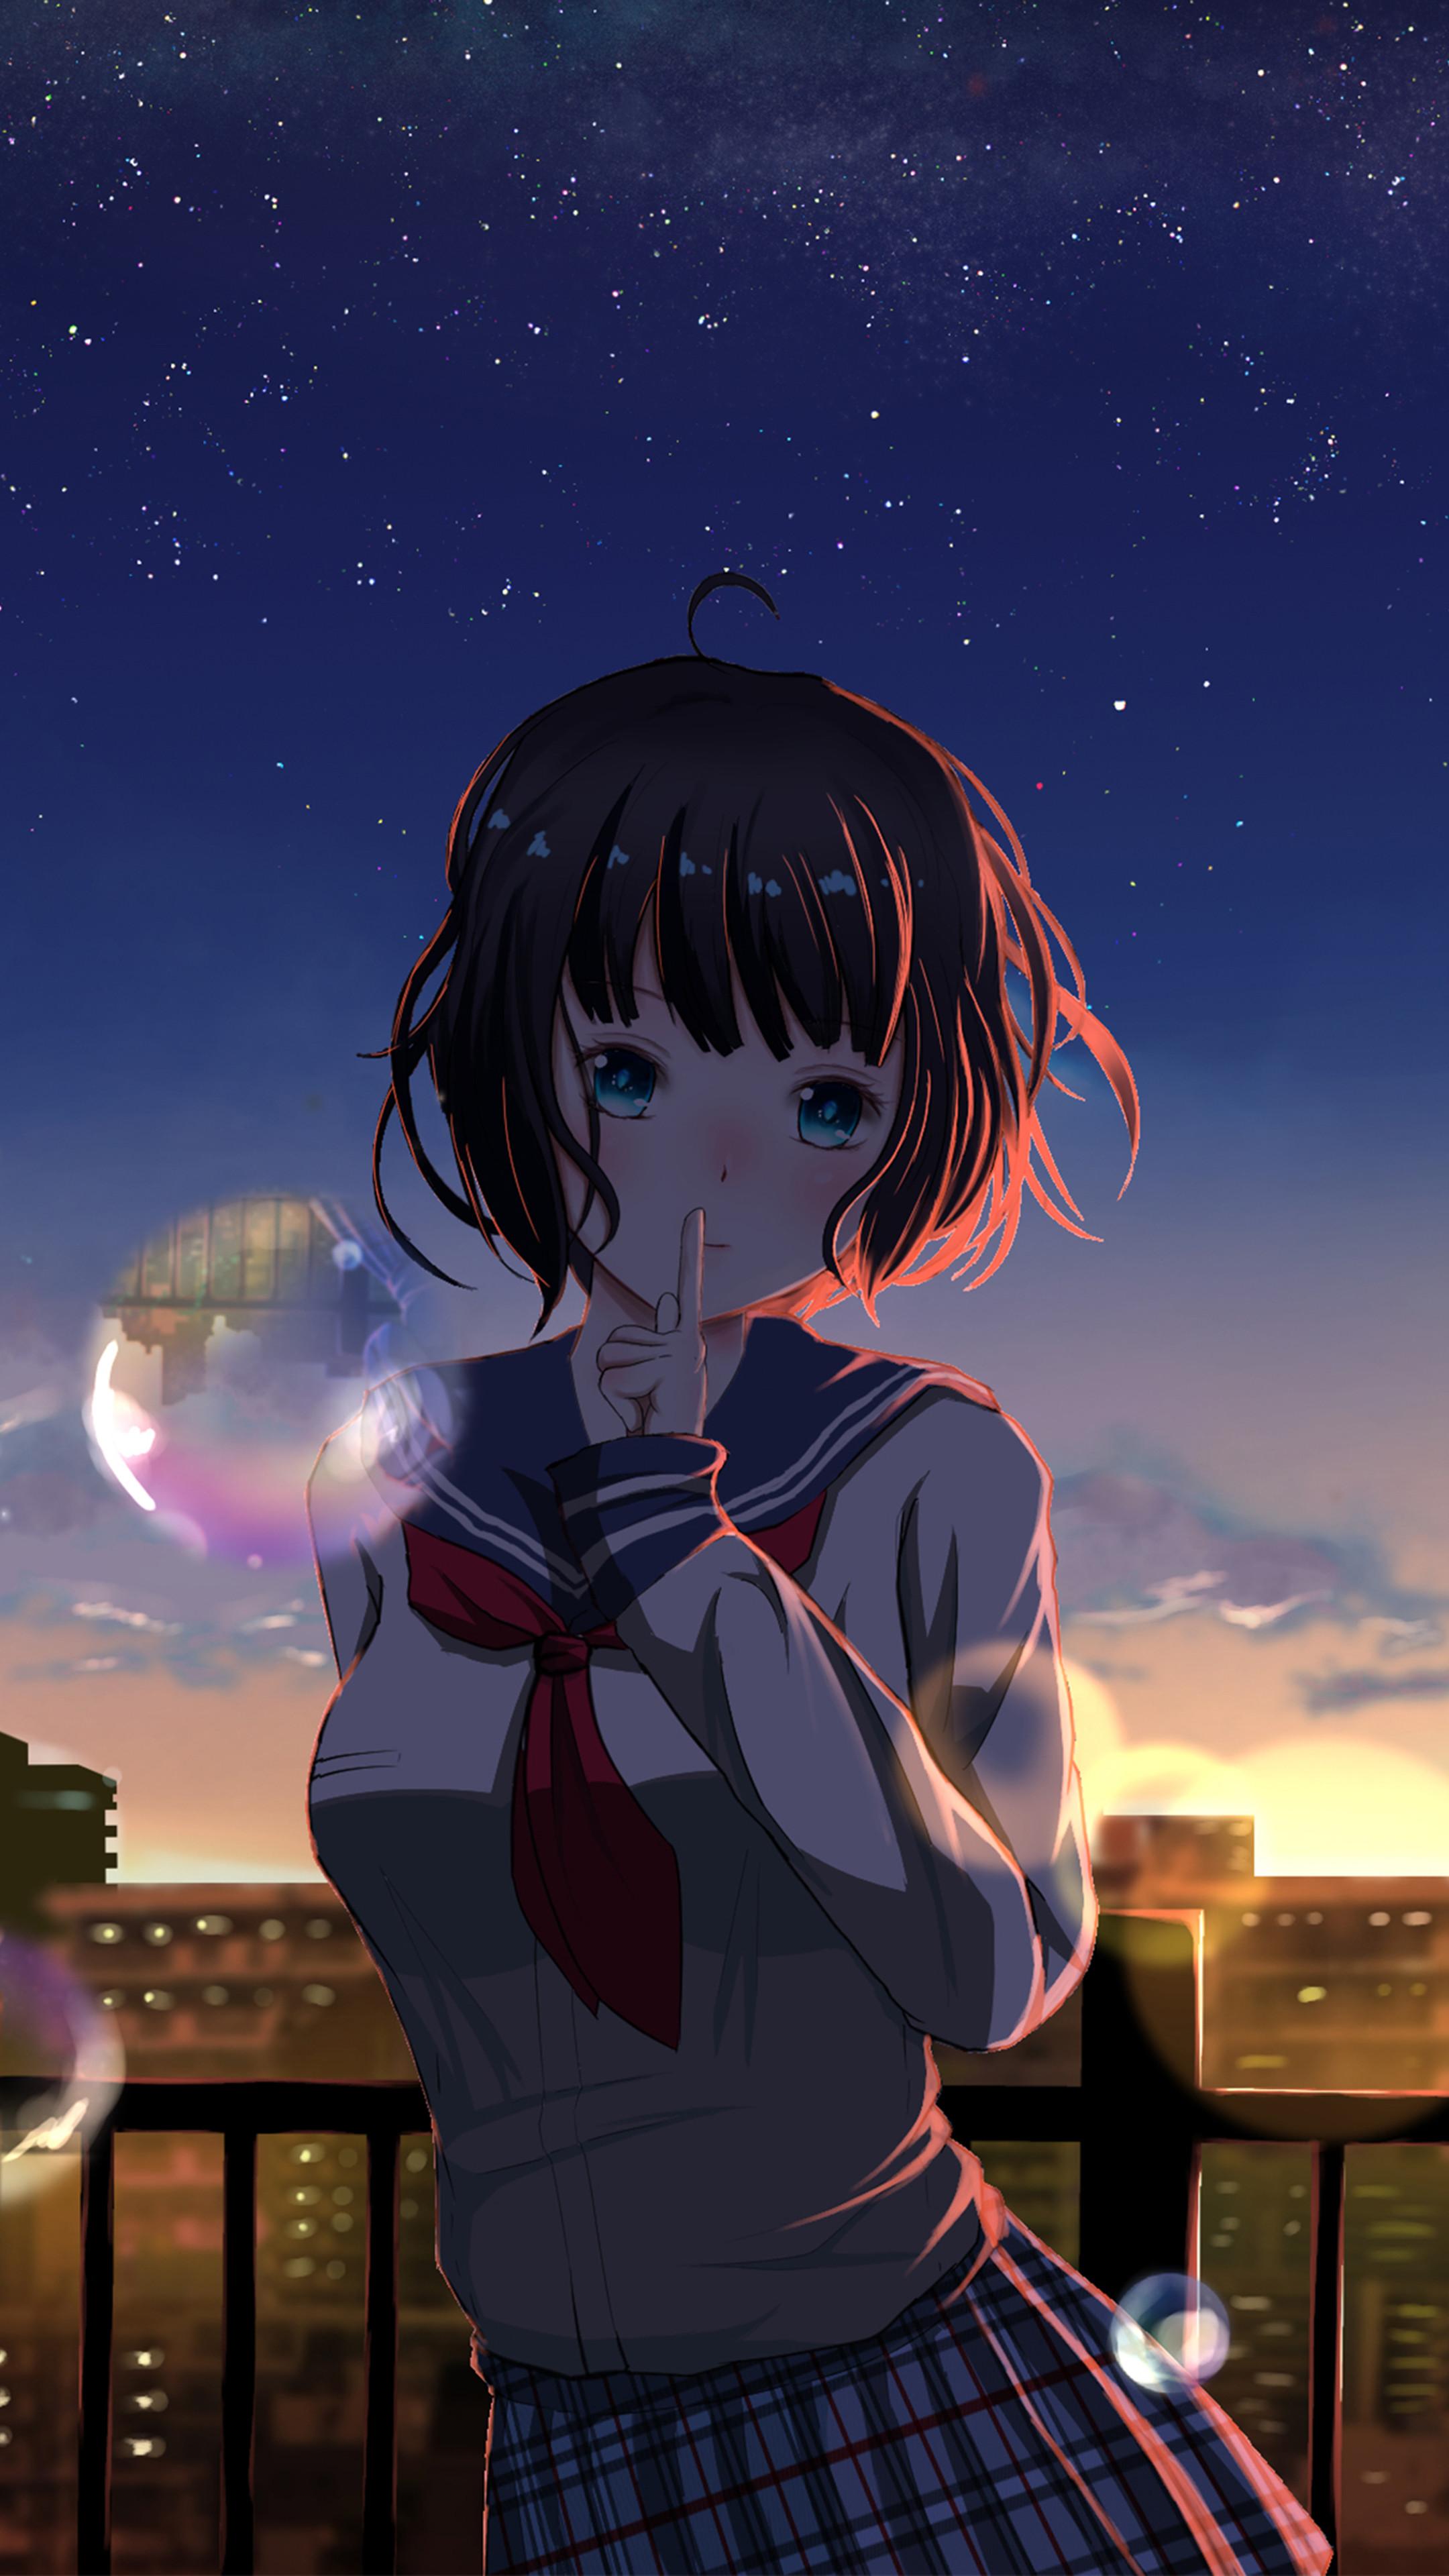 Anime 4k Wallpapers For Desktop Mobile Anime School Boy Wallpaper Hd 2160x3840 Download Hd Wallpaper Wallpapertip